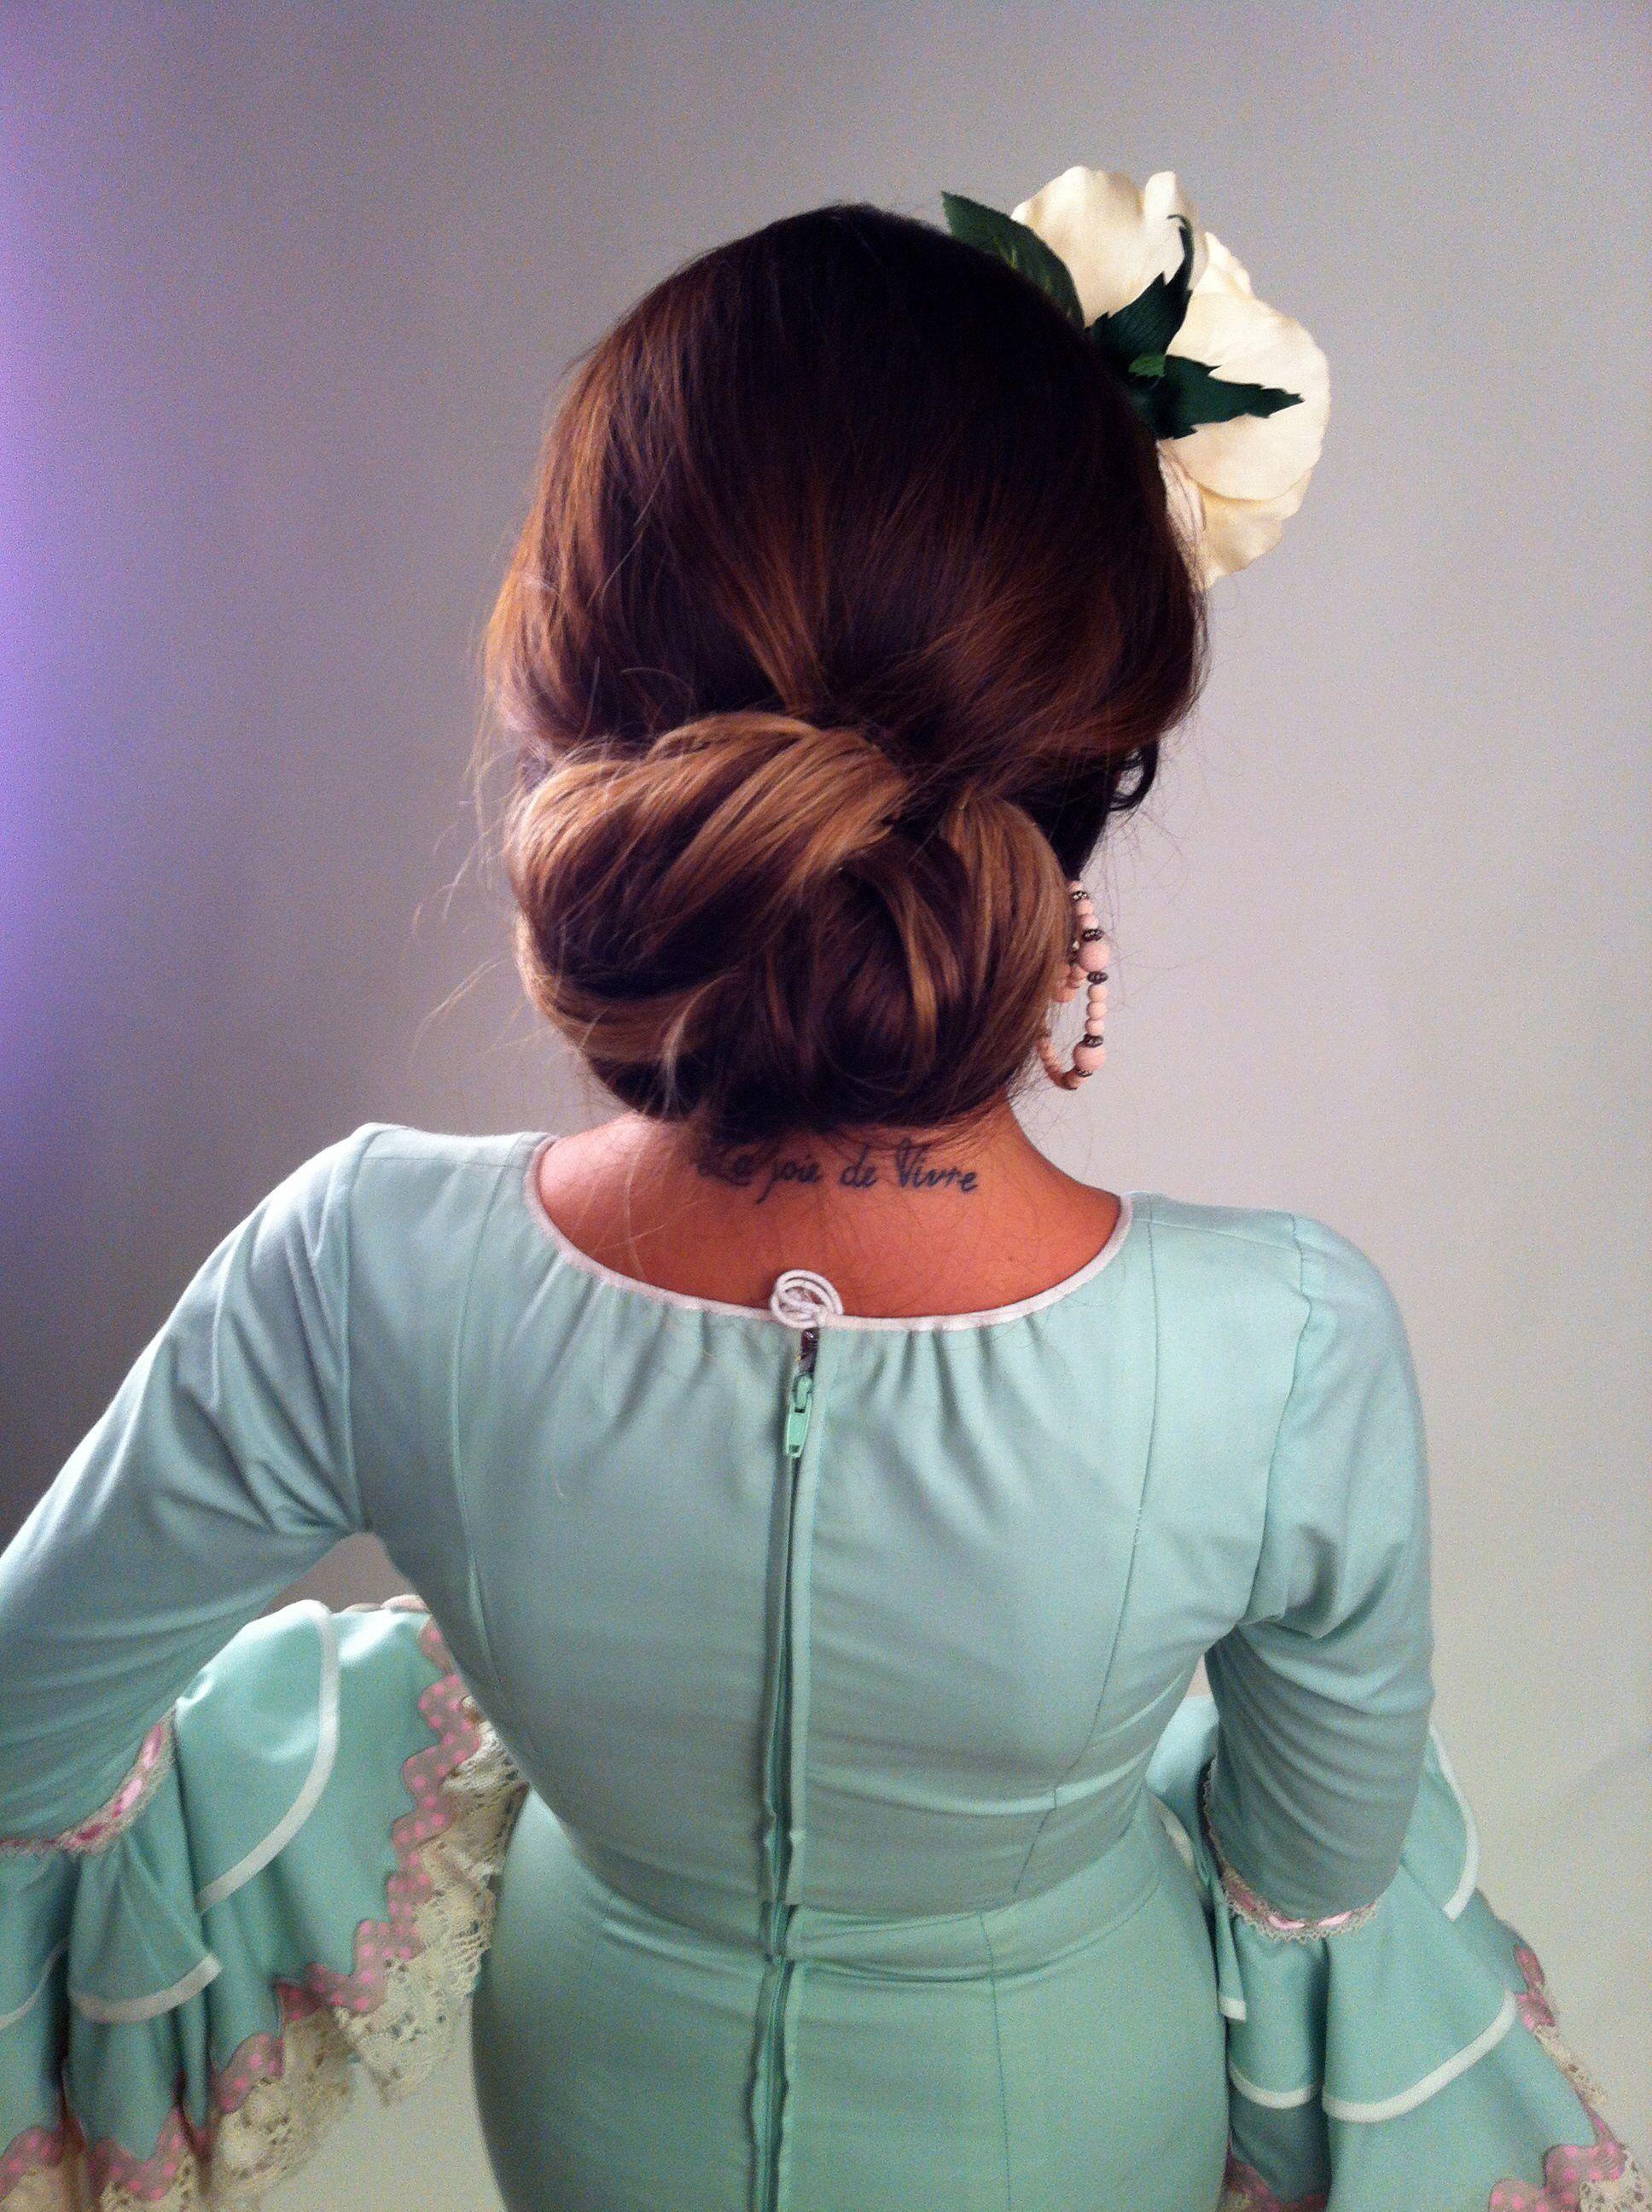 Miradas ganadoras con peinados de gitana Fotos de los cortes de pelo de las tendencias - Sesión fotos flamenca. | Hair styles, Hair hacks, Hairstyle